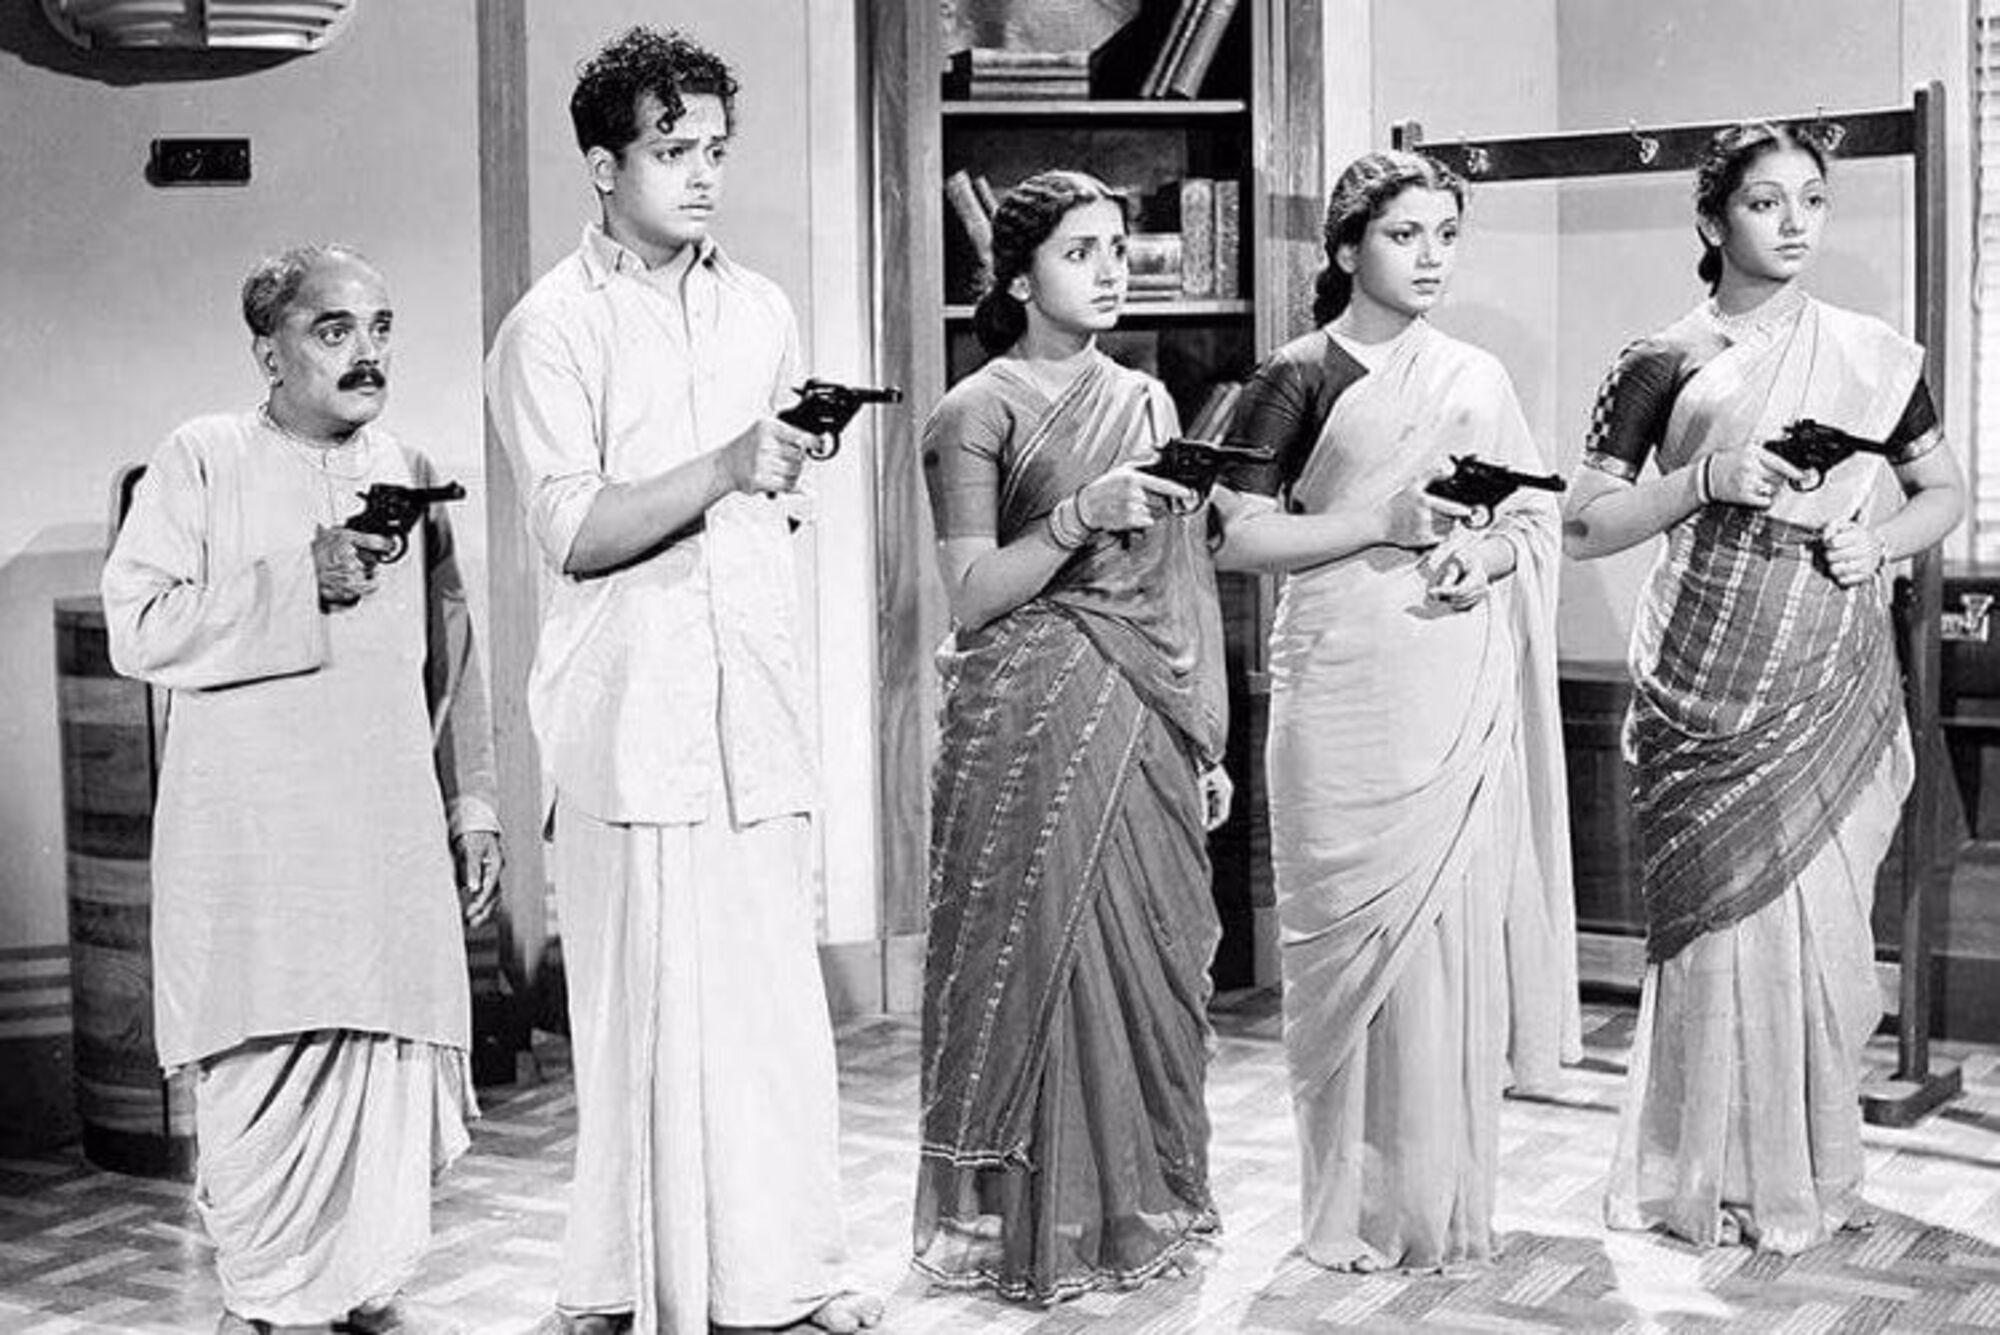 Andha Naal (1954) - Directed by S. Balachander. Sivaji Ganesan, Pandari Bai, Javar Seetharaman & others